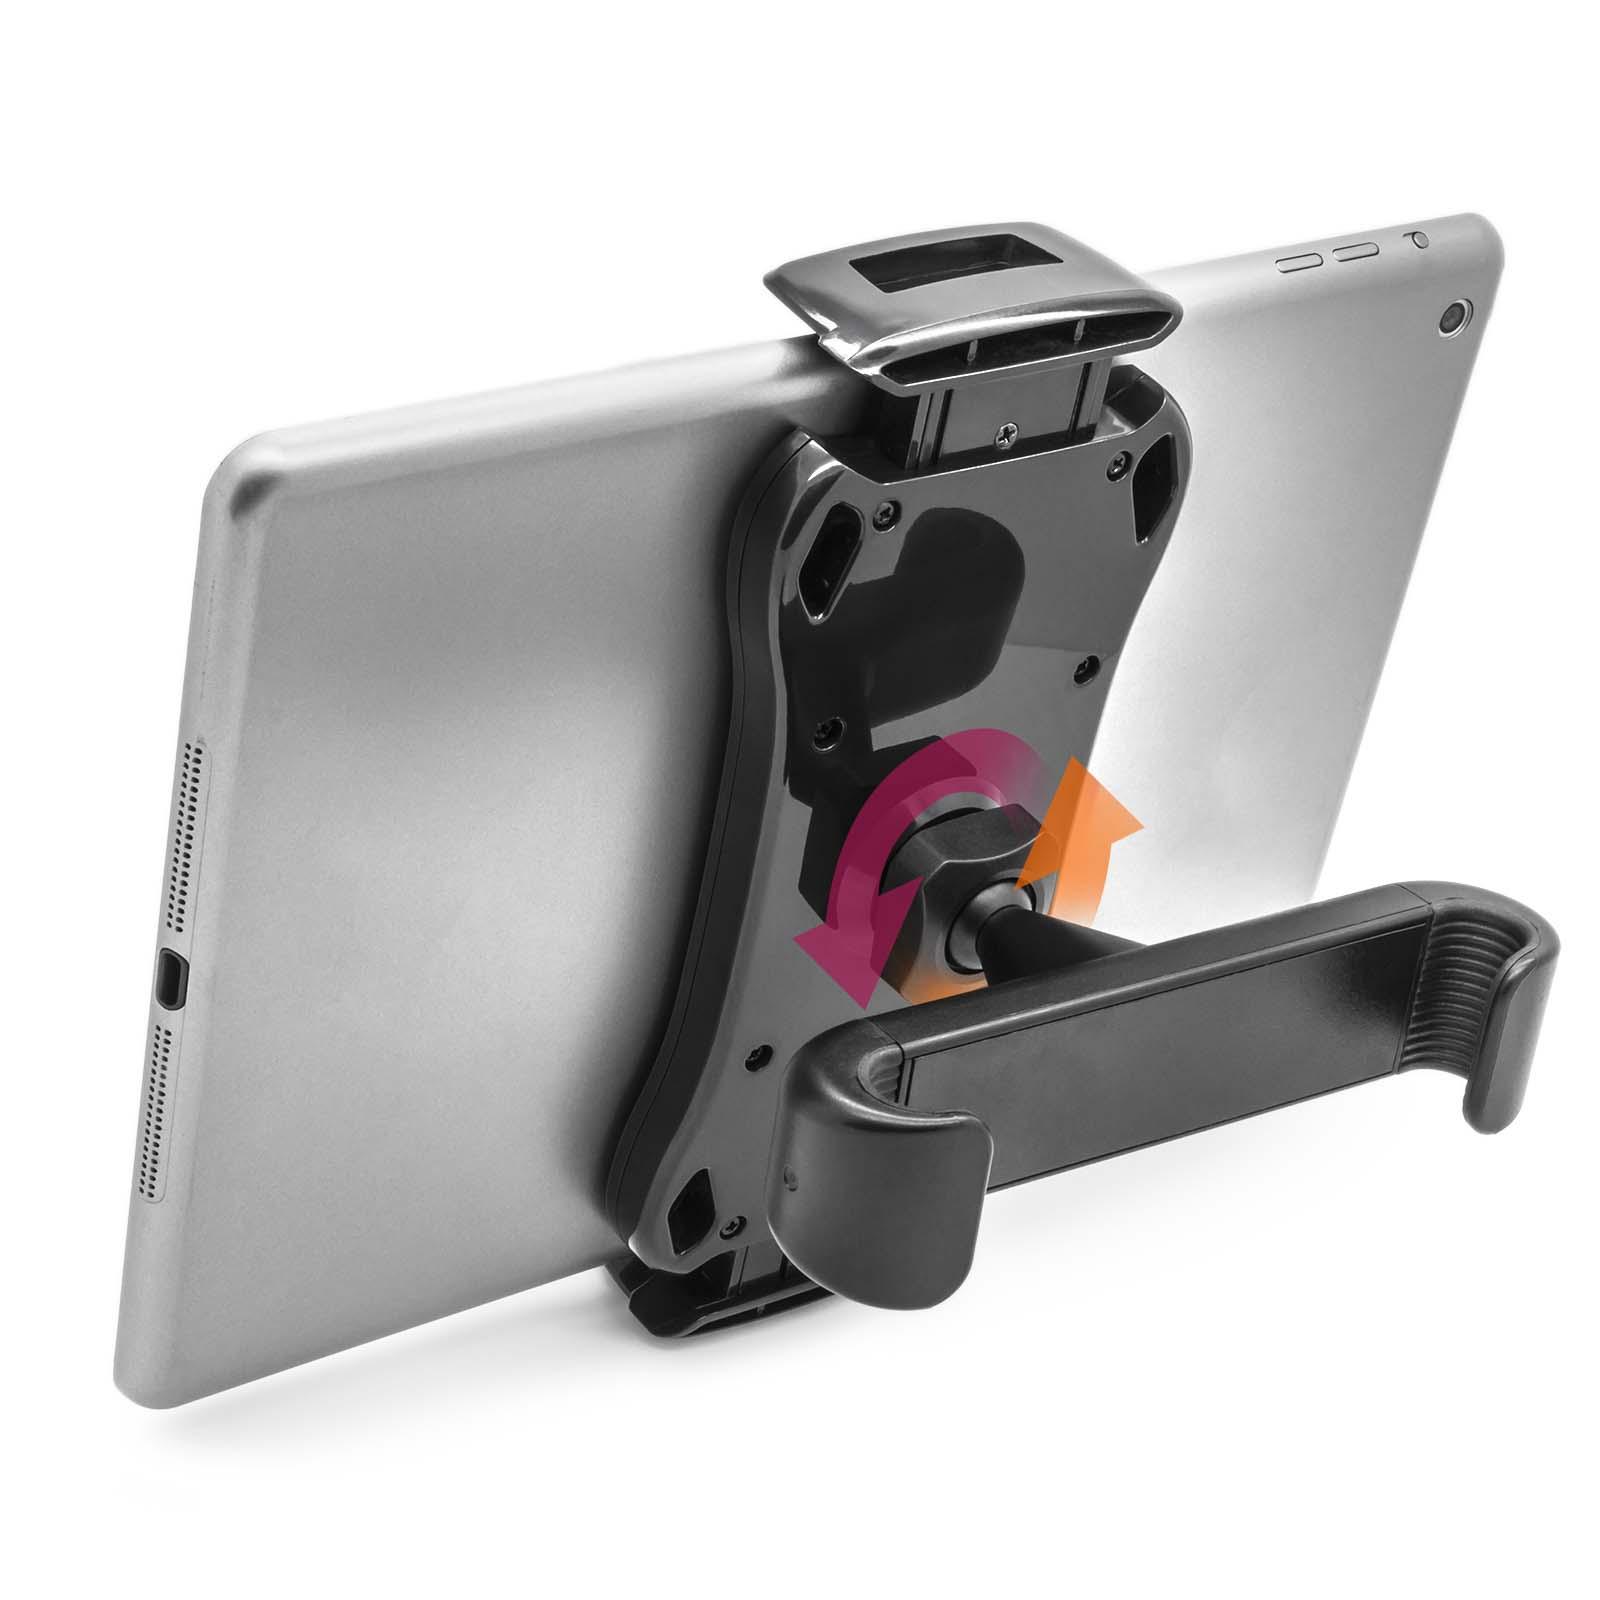 mobilefox tablet r ck sitz halter universal auto kopf. Black Bedroom Furniture Sets. Home Design Ideas